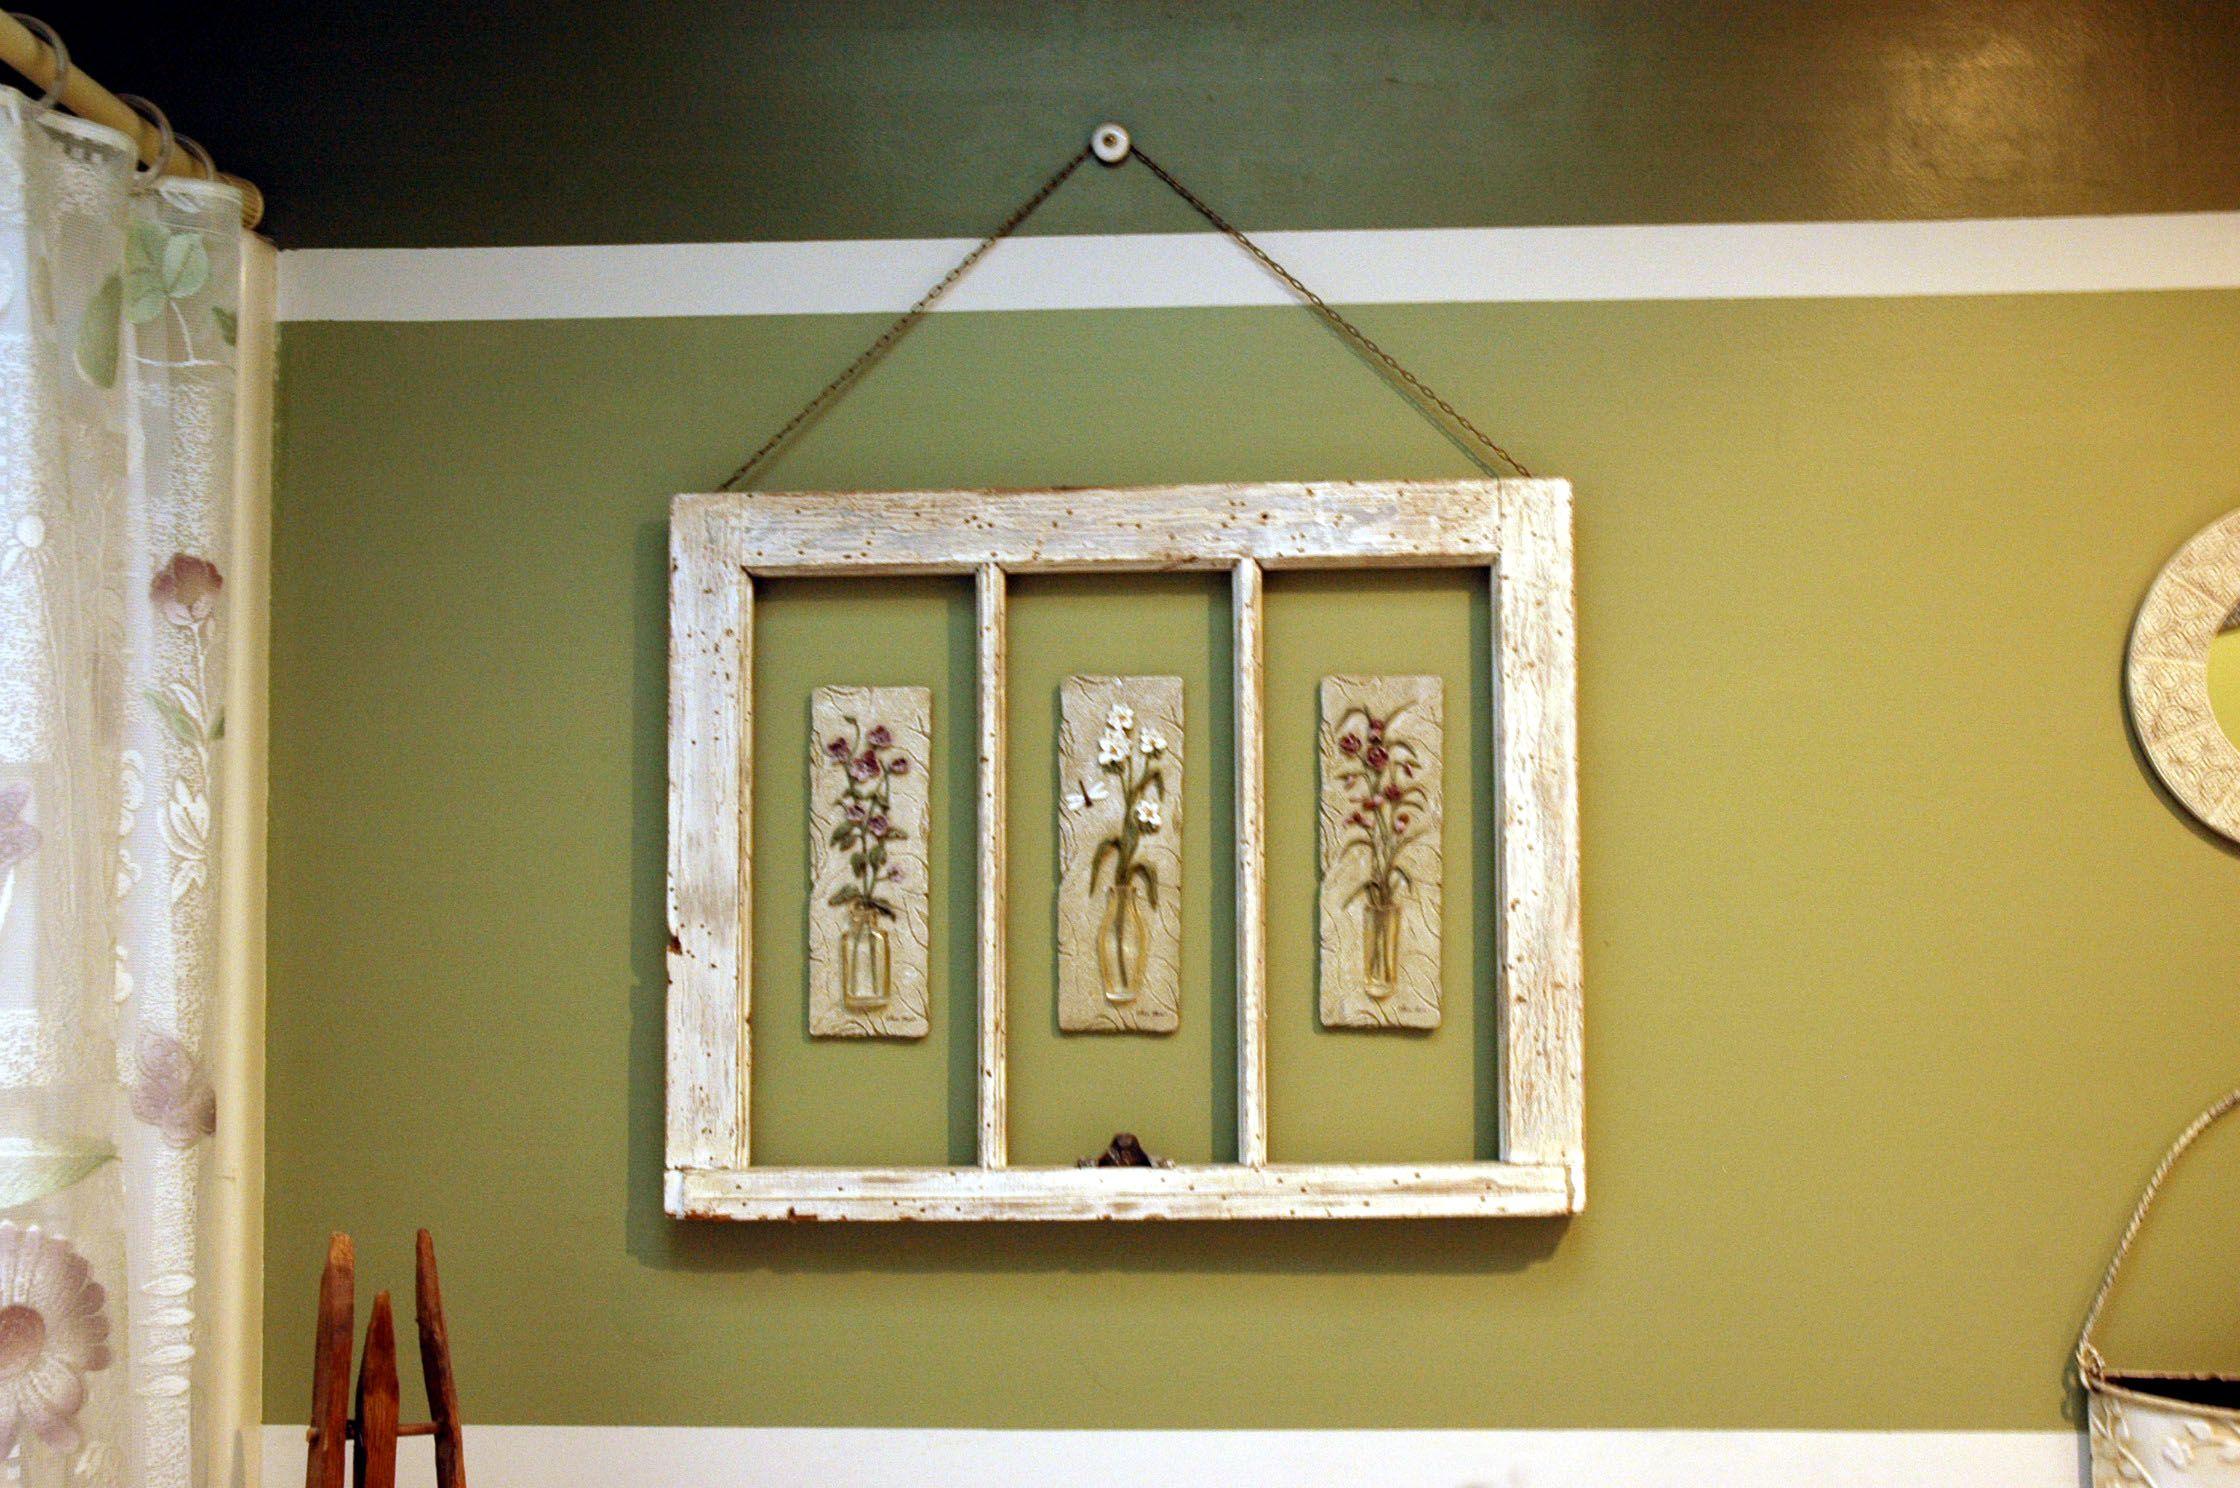 Framed Bathroom Art   Window frames, Window and Bathroom art